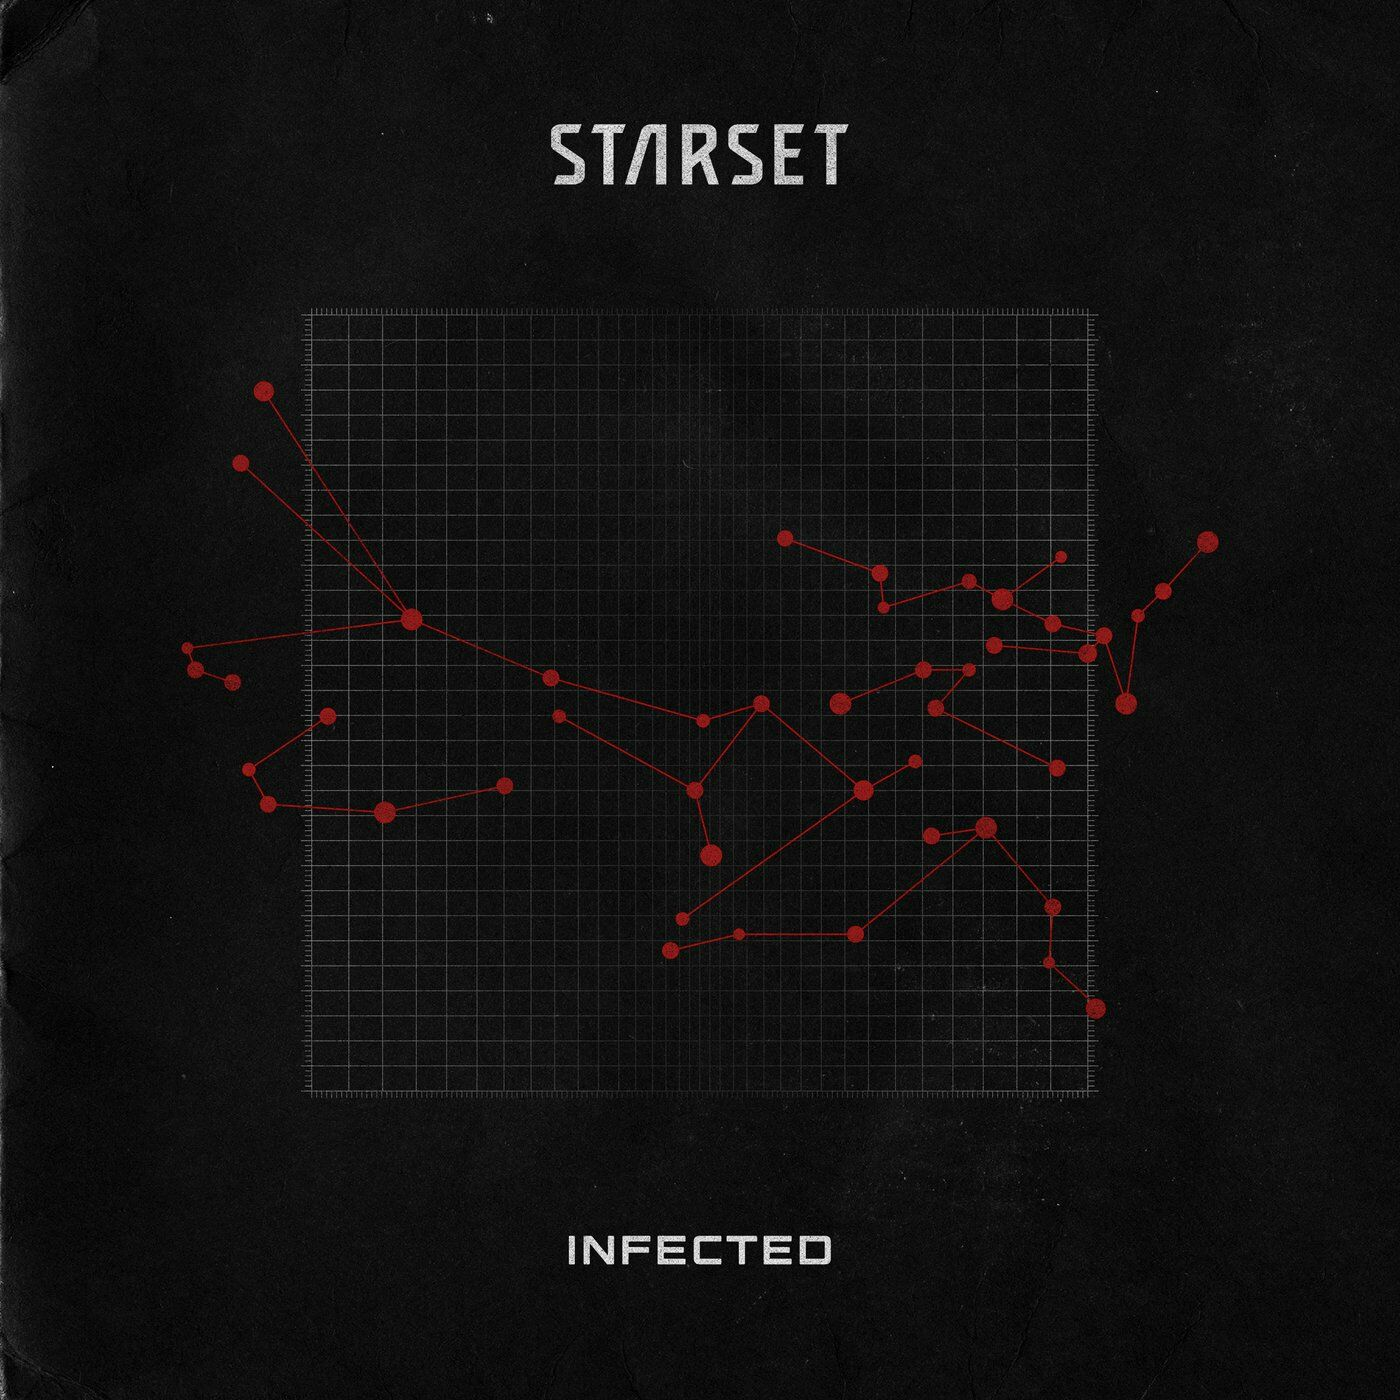 Starset - INFECTED [single] (2021)